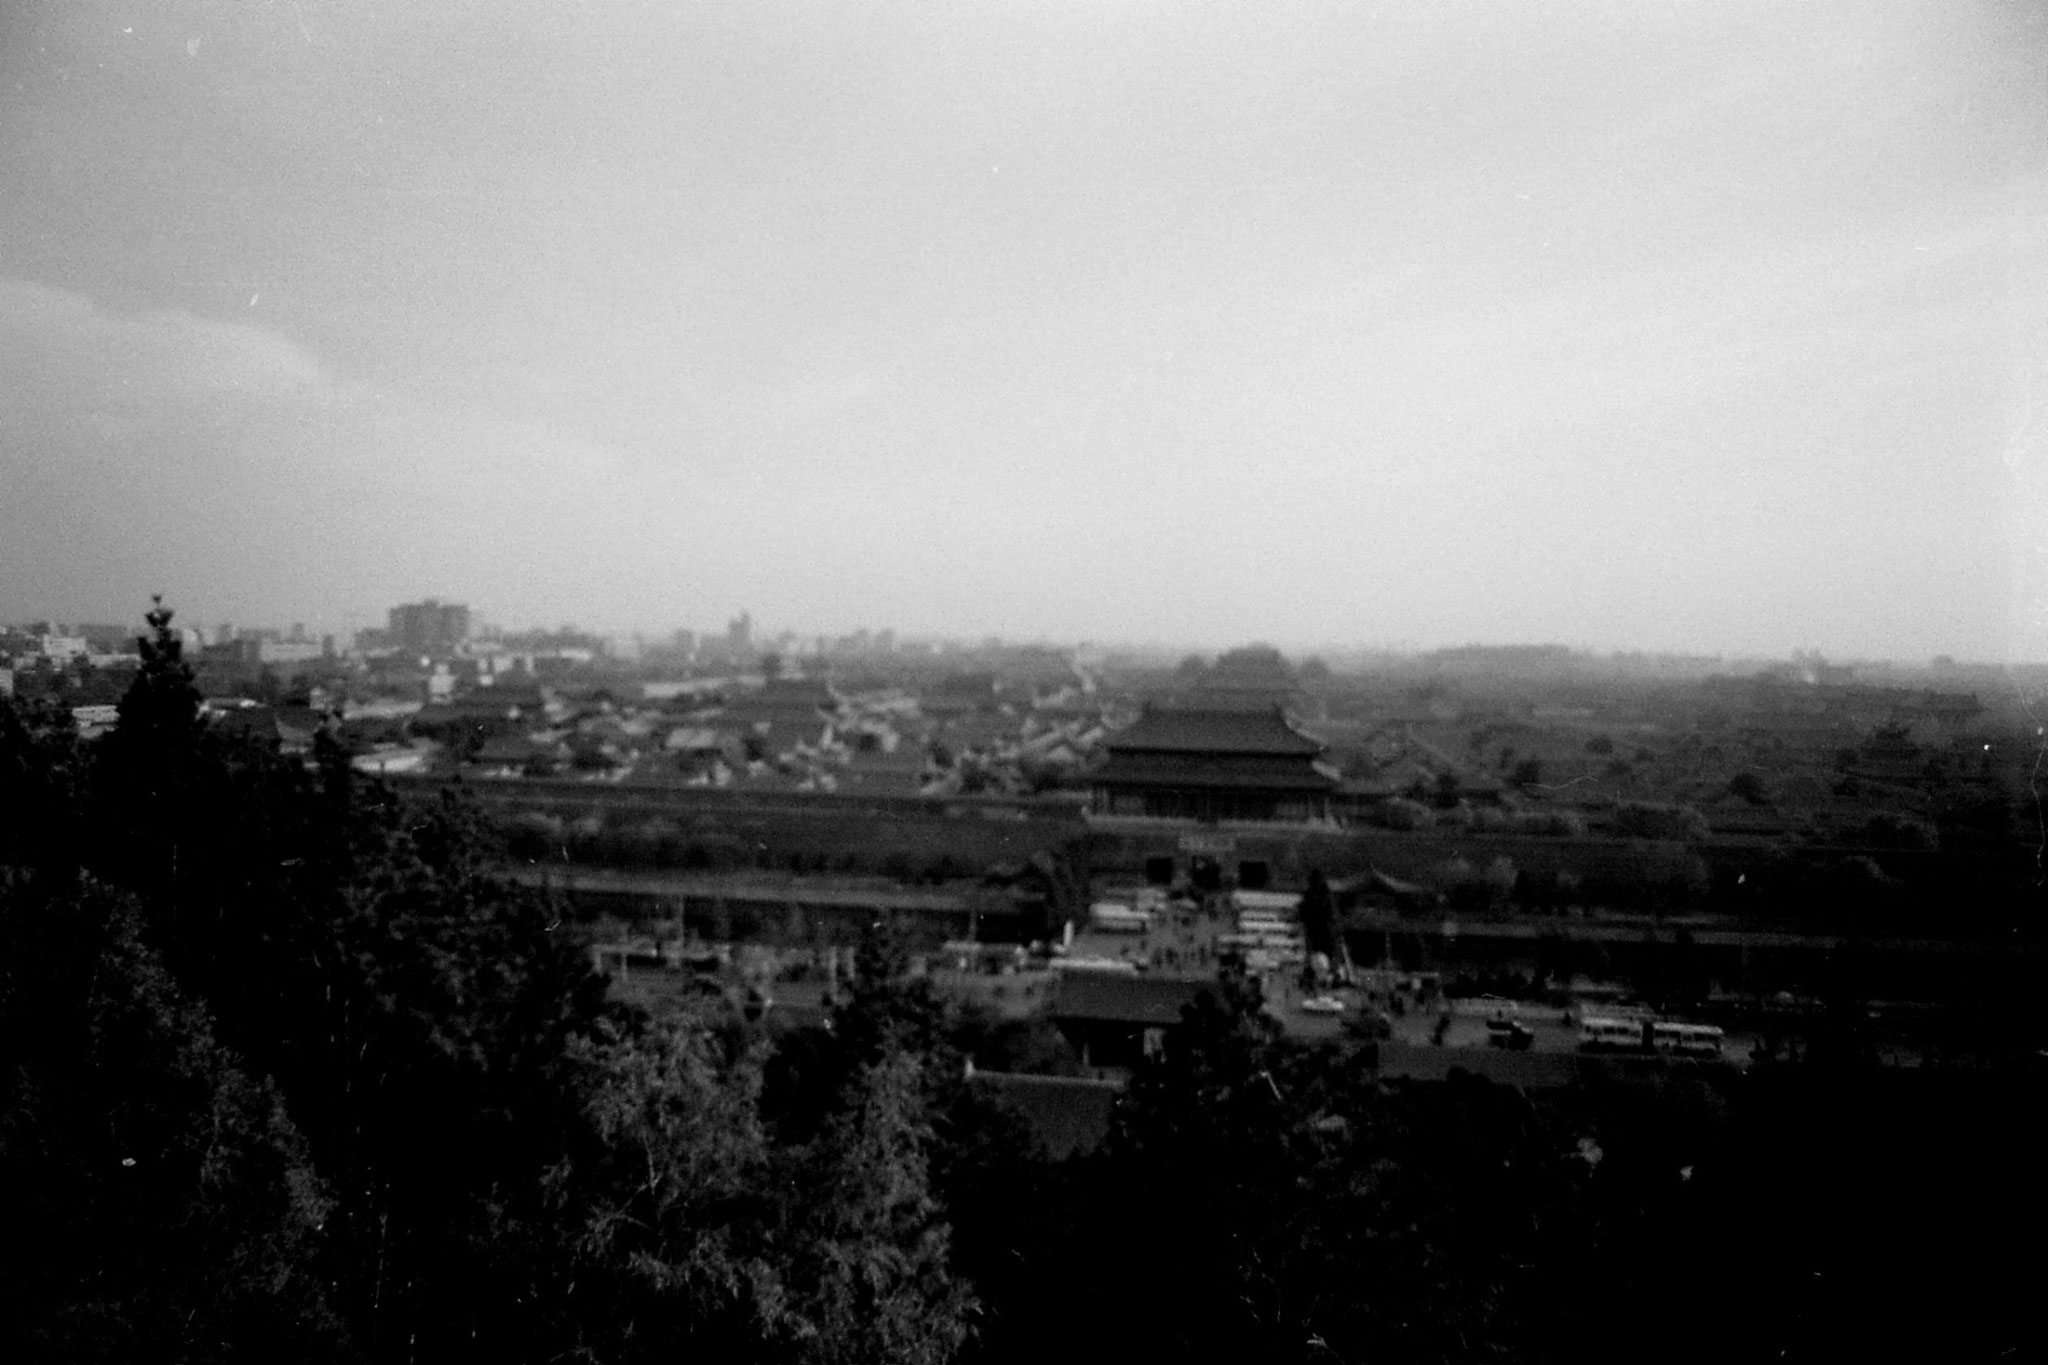 18/11/1988: 7: Coal Hill